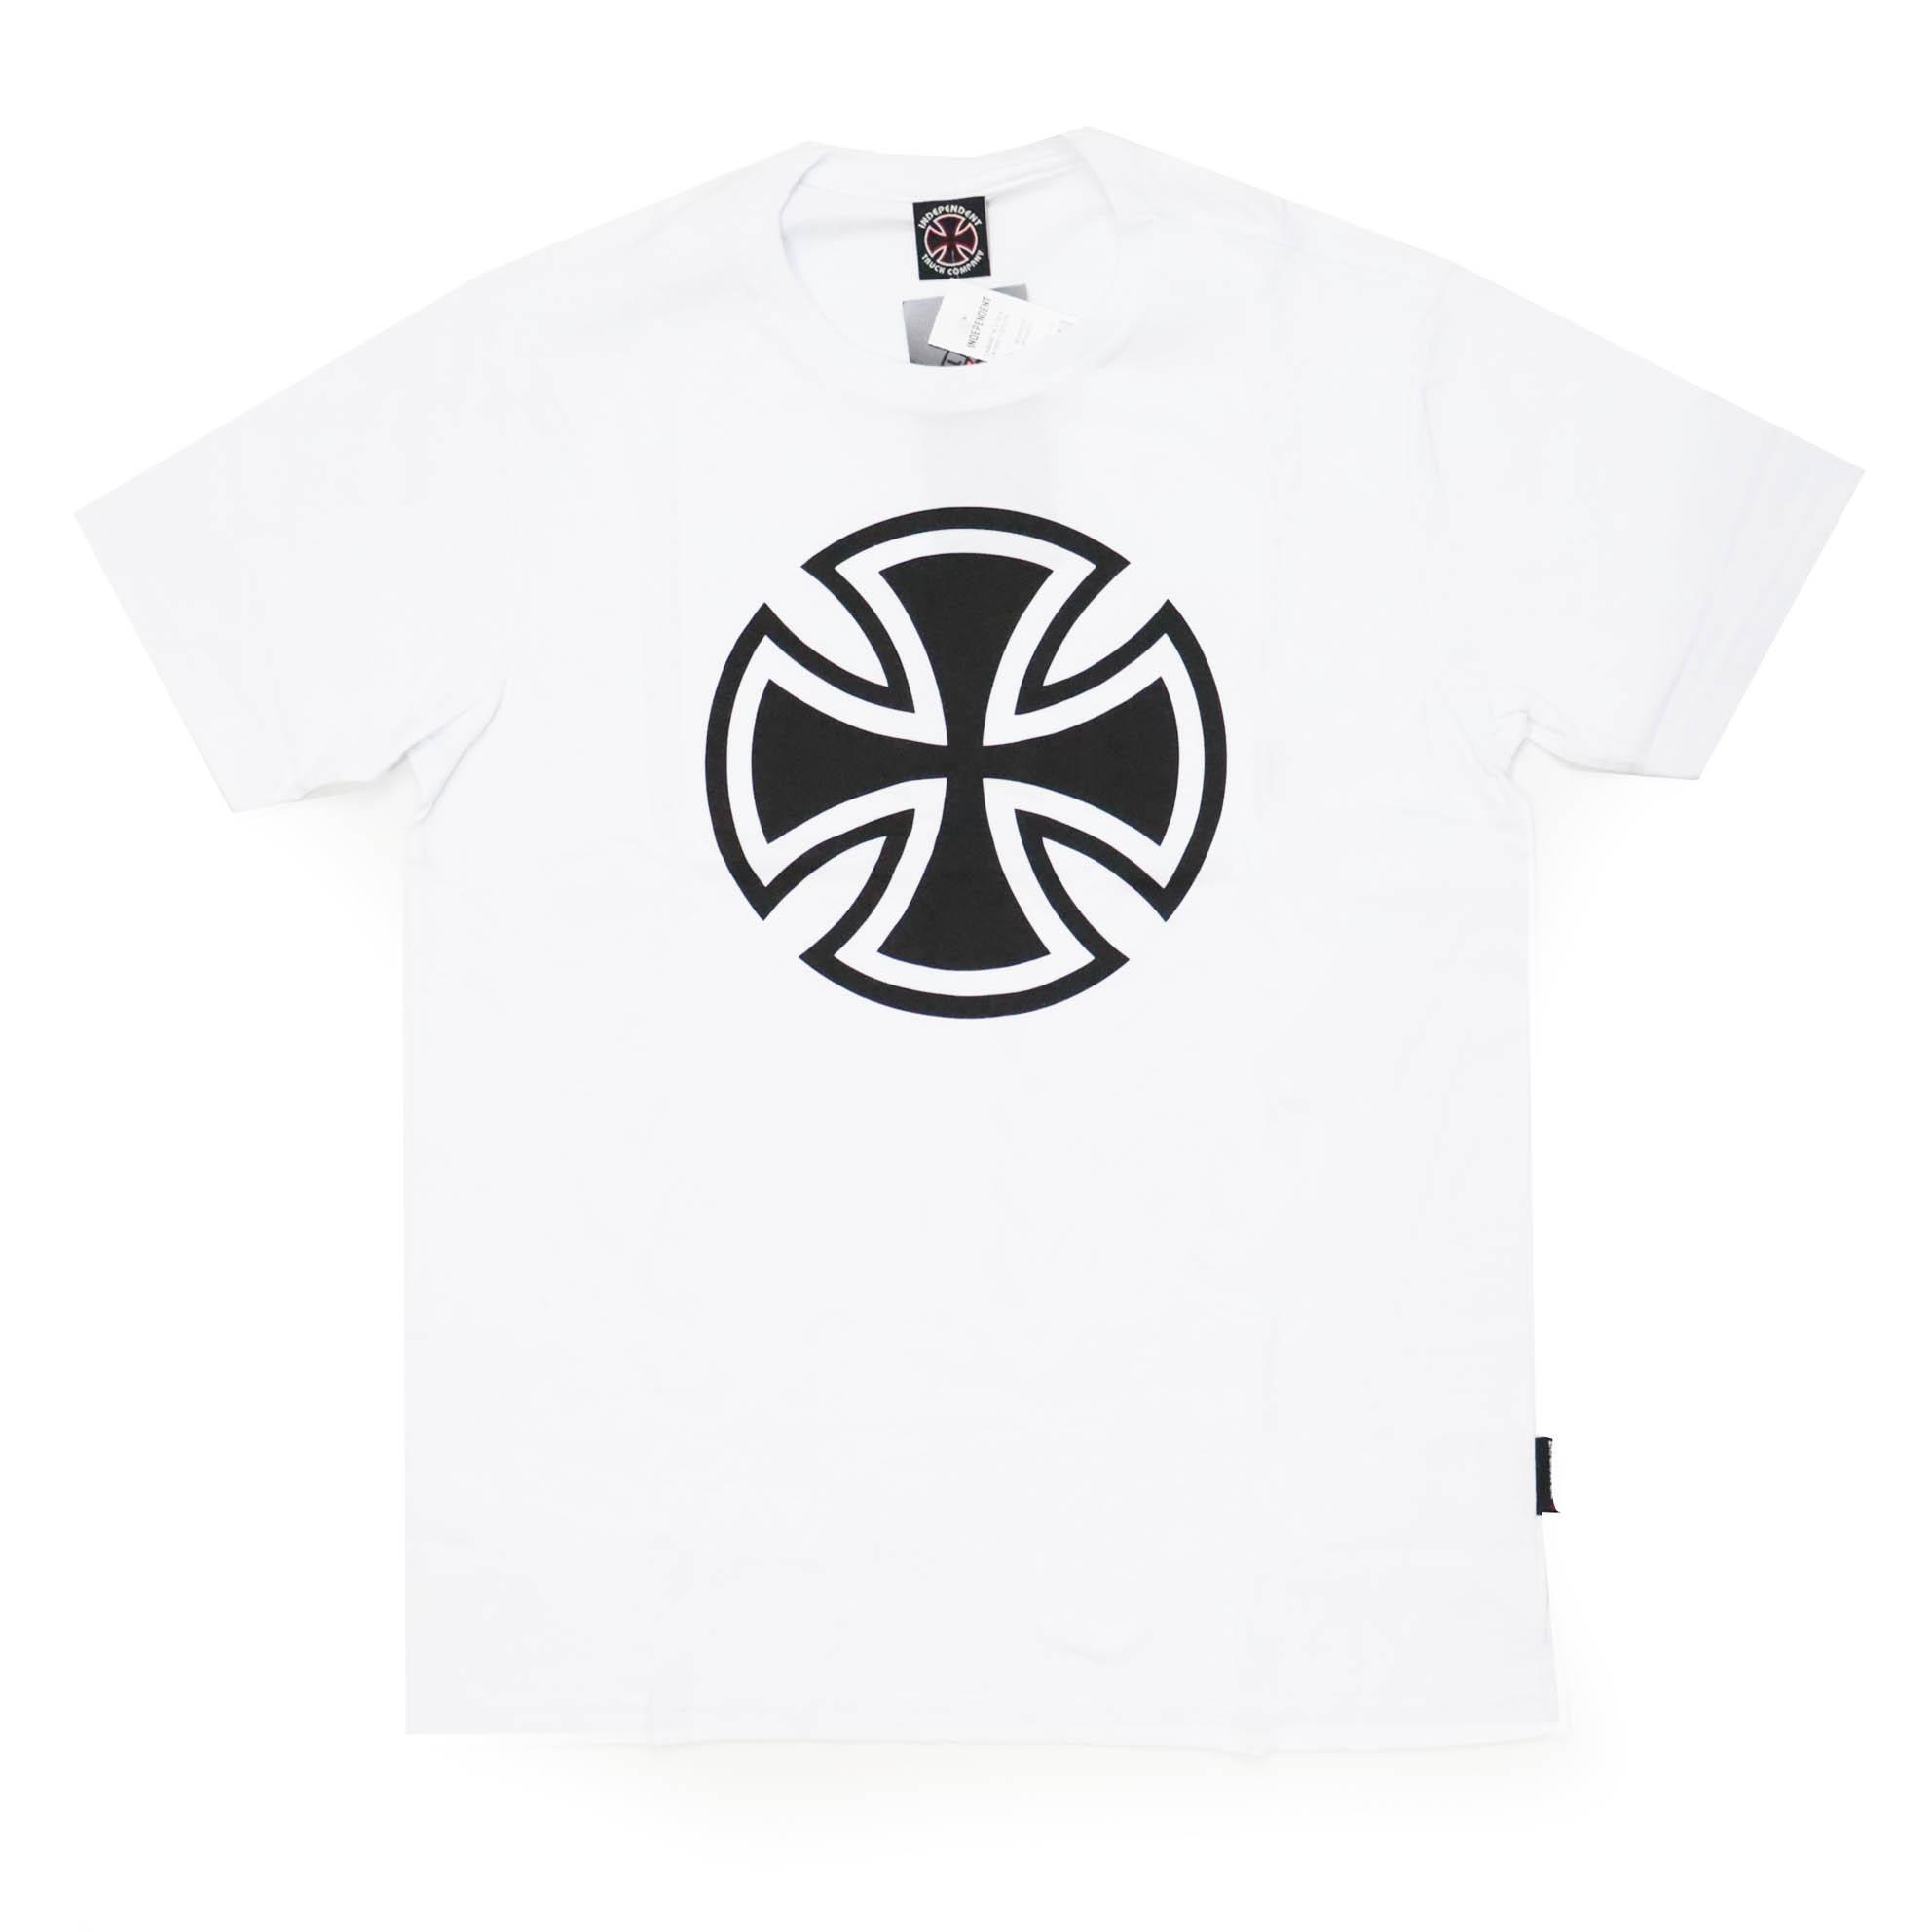 Camiseta Independent 3 Tier Cross 1 Color - Branco